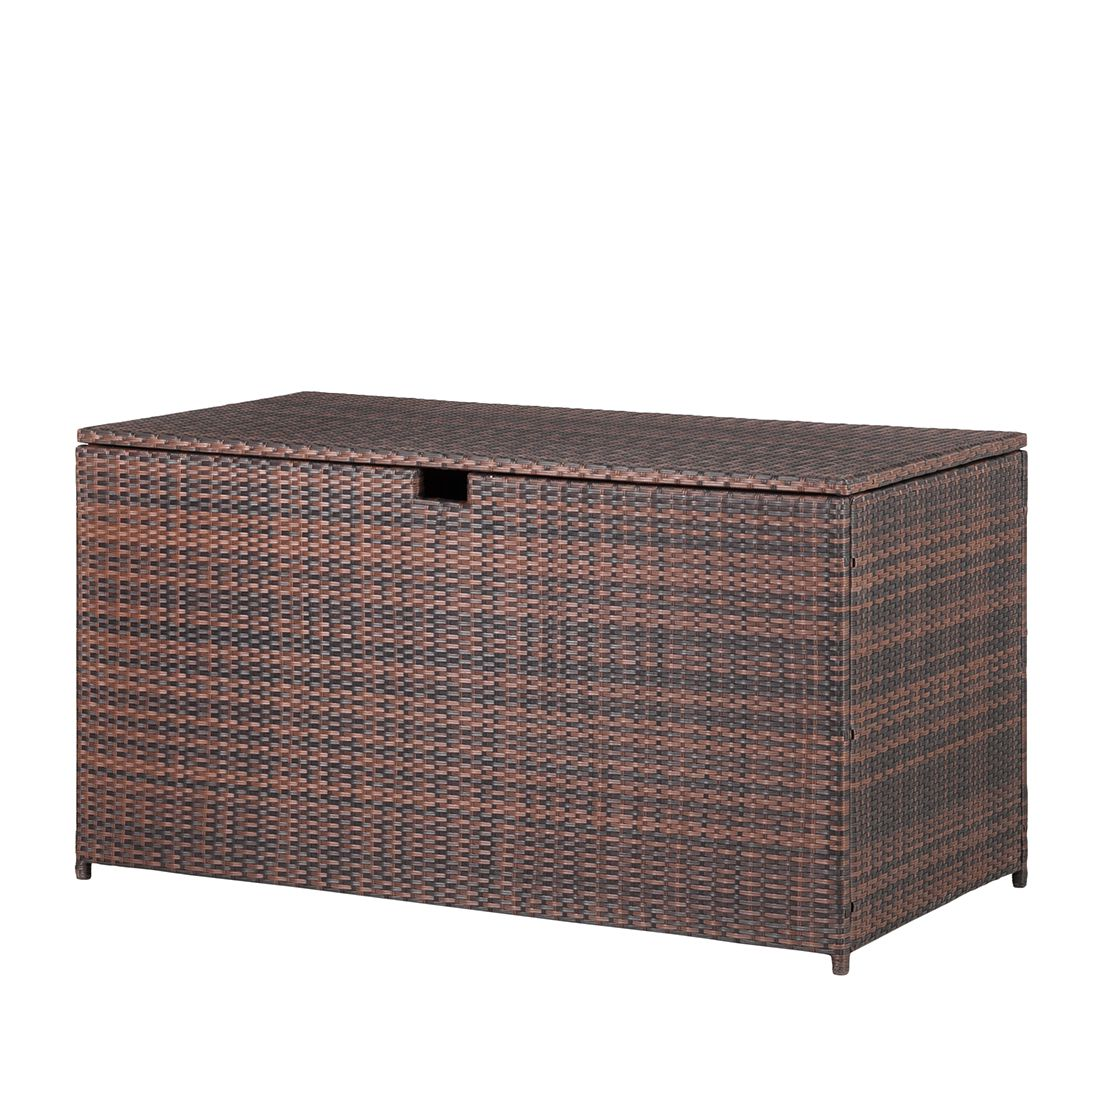 garten lounge m bel reduziert tj04 hitoiro. Black Bedroom Furniture Sets. Home Design Ideas